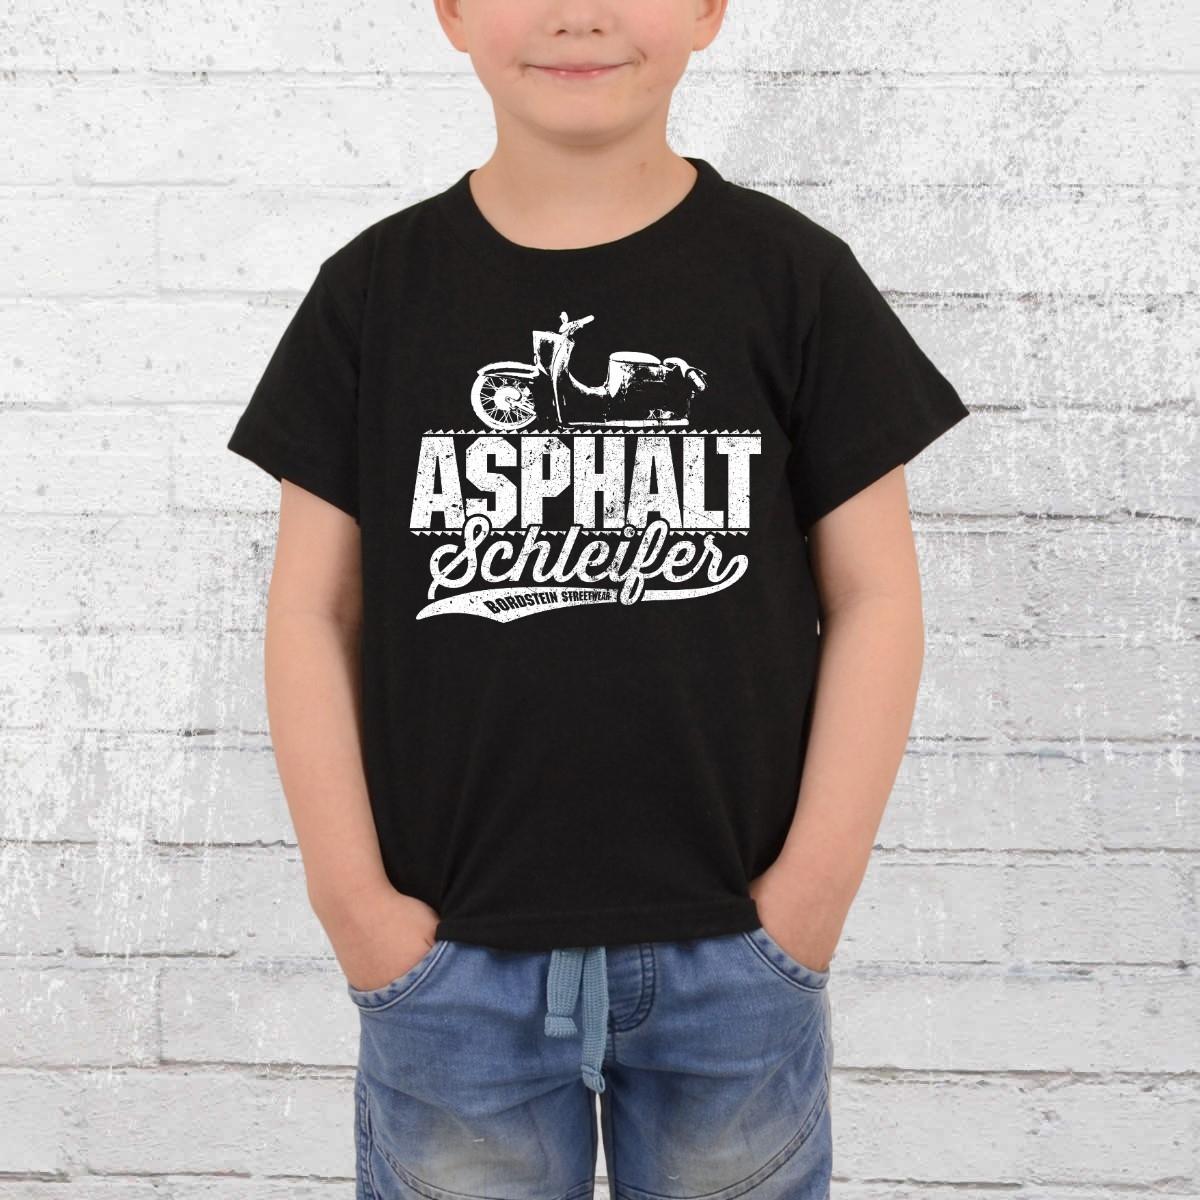 Bordstein T-Shirt Kinder Asphaltschleifer schwarz